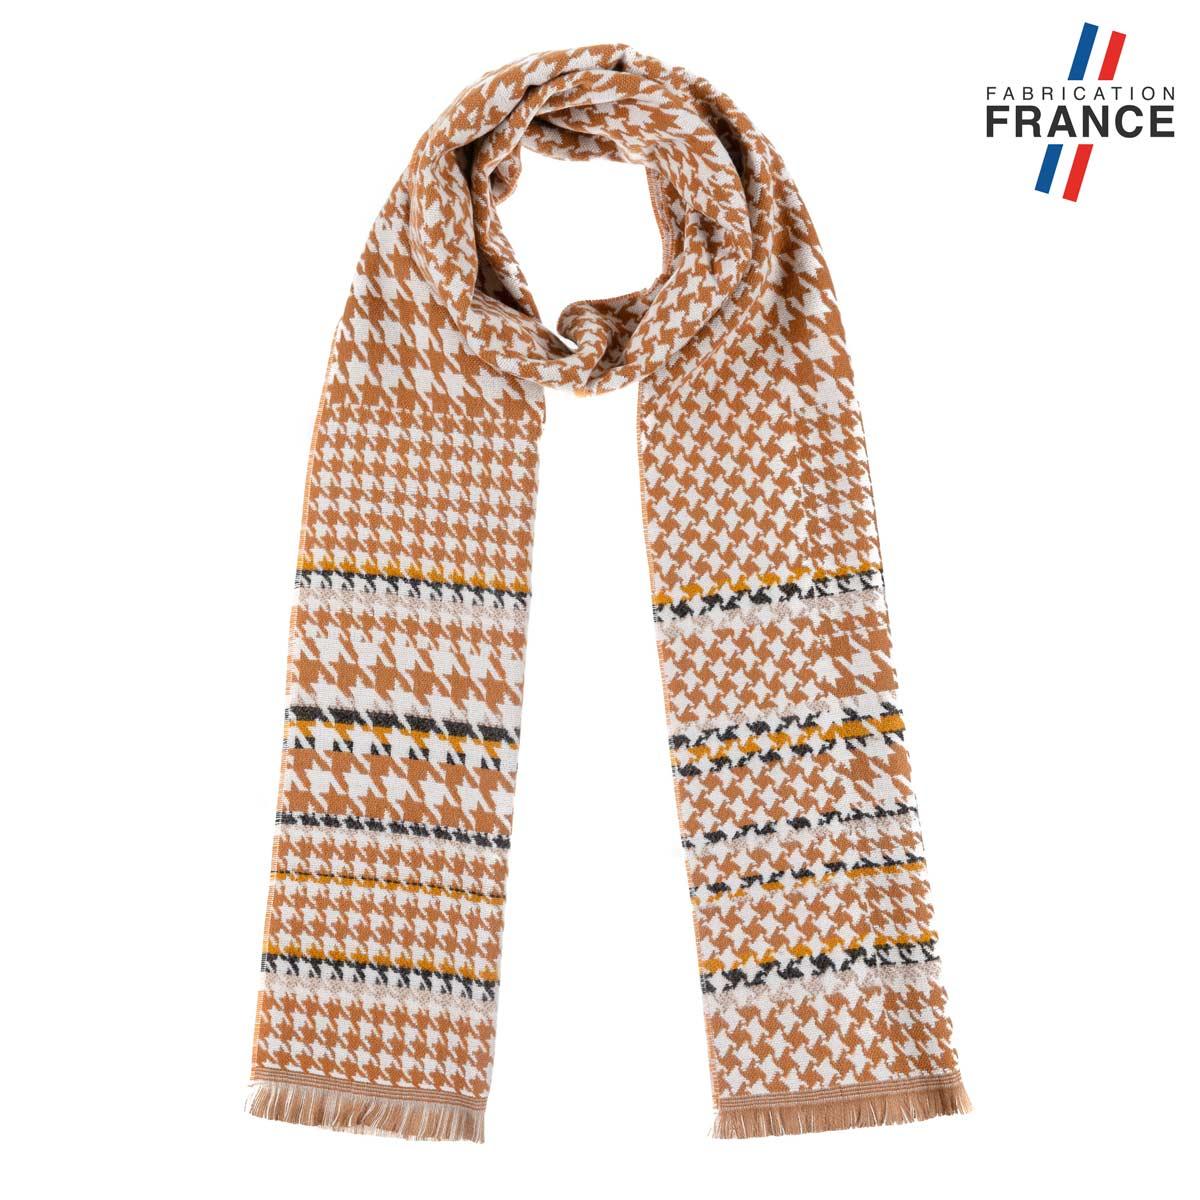 AT-06230_F12-1FR_Echarpe-fabriquee-en-france-pied-poule-beige